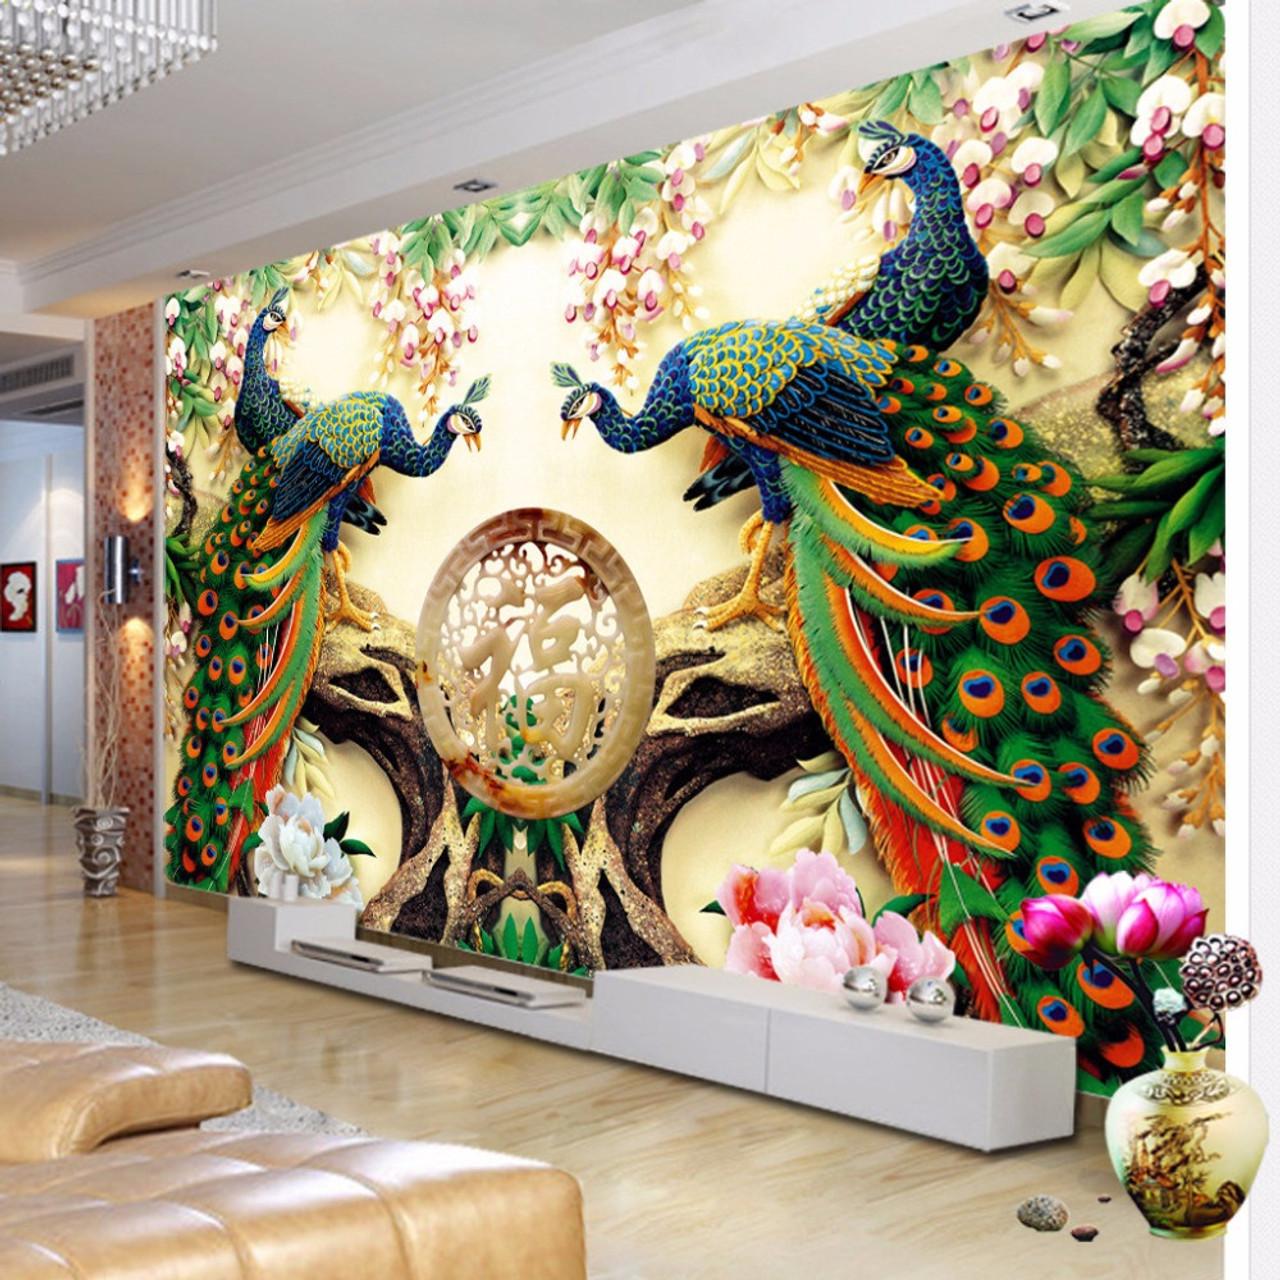 Custom 3d Wall Mural Wallpaper -woven Peacock Living